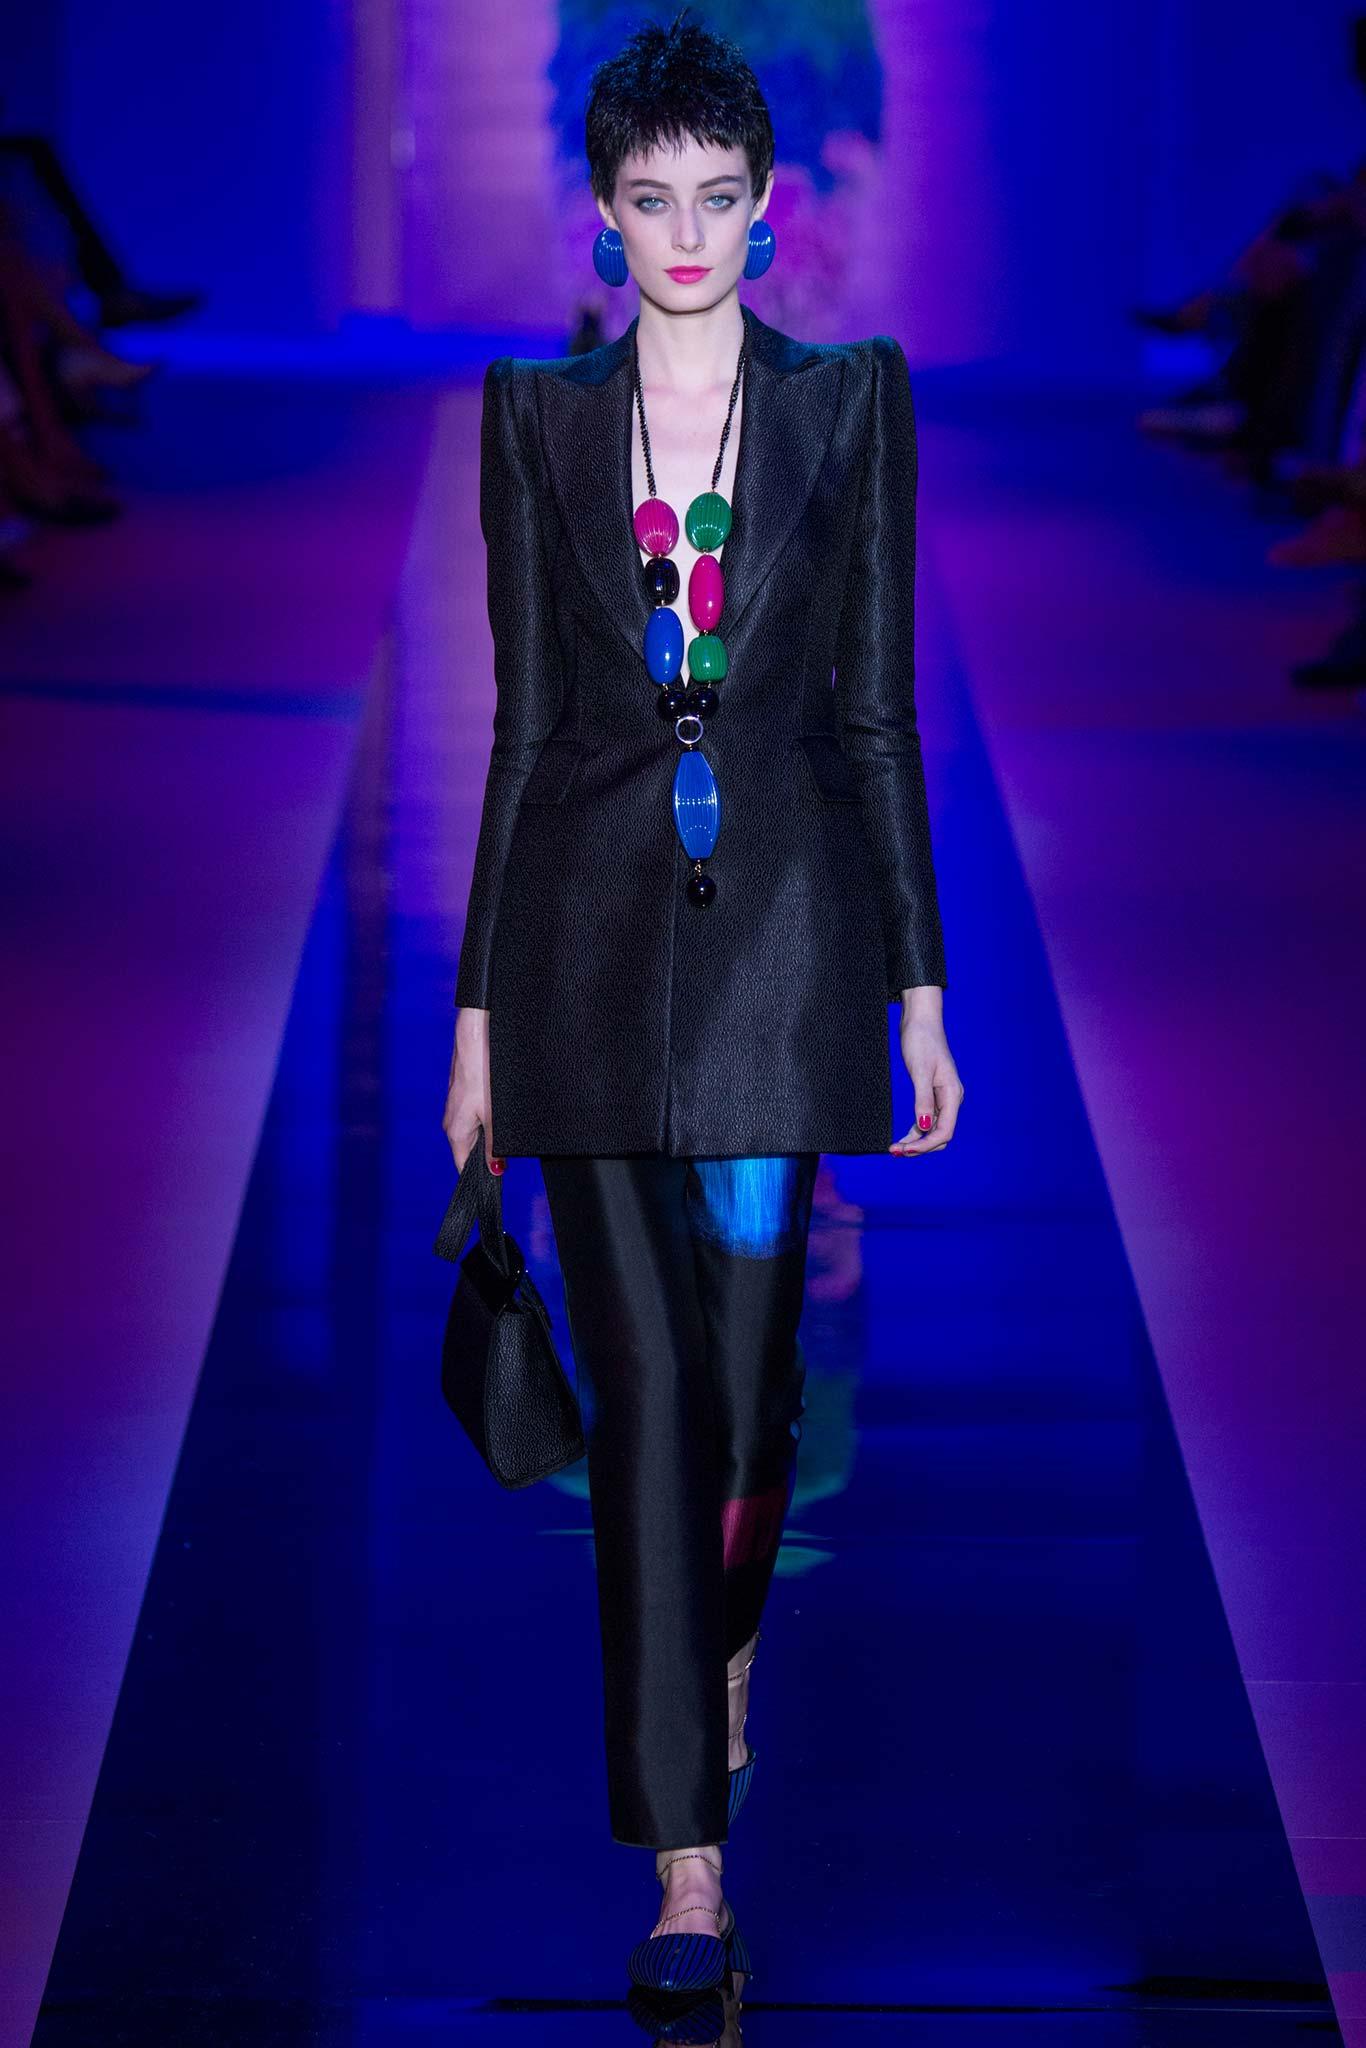 Armani-Prive-fall-15-couture-6.jpg